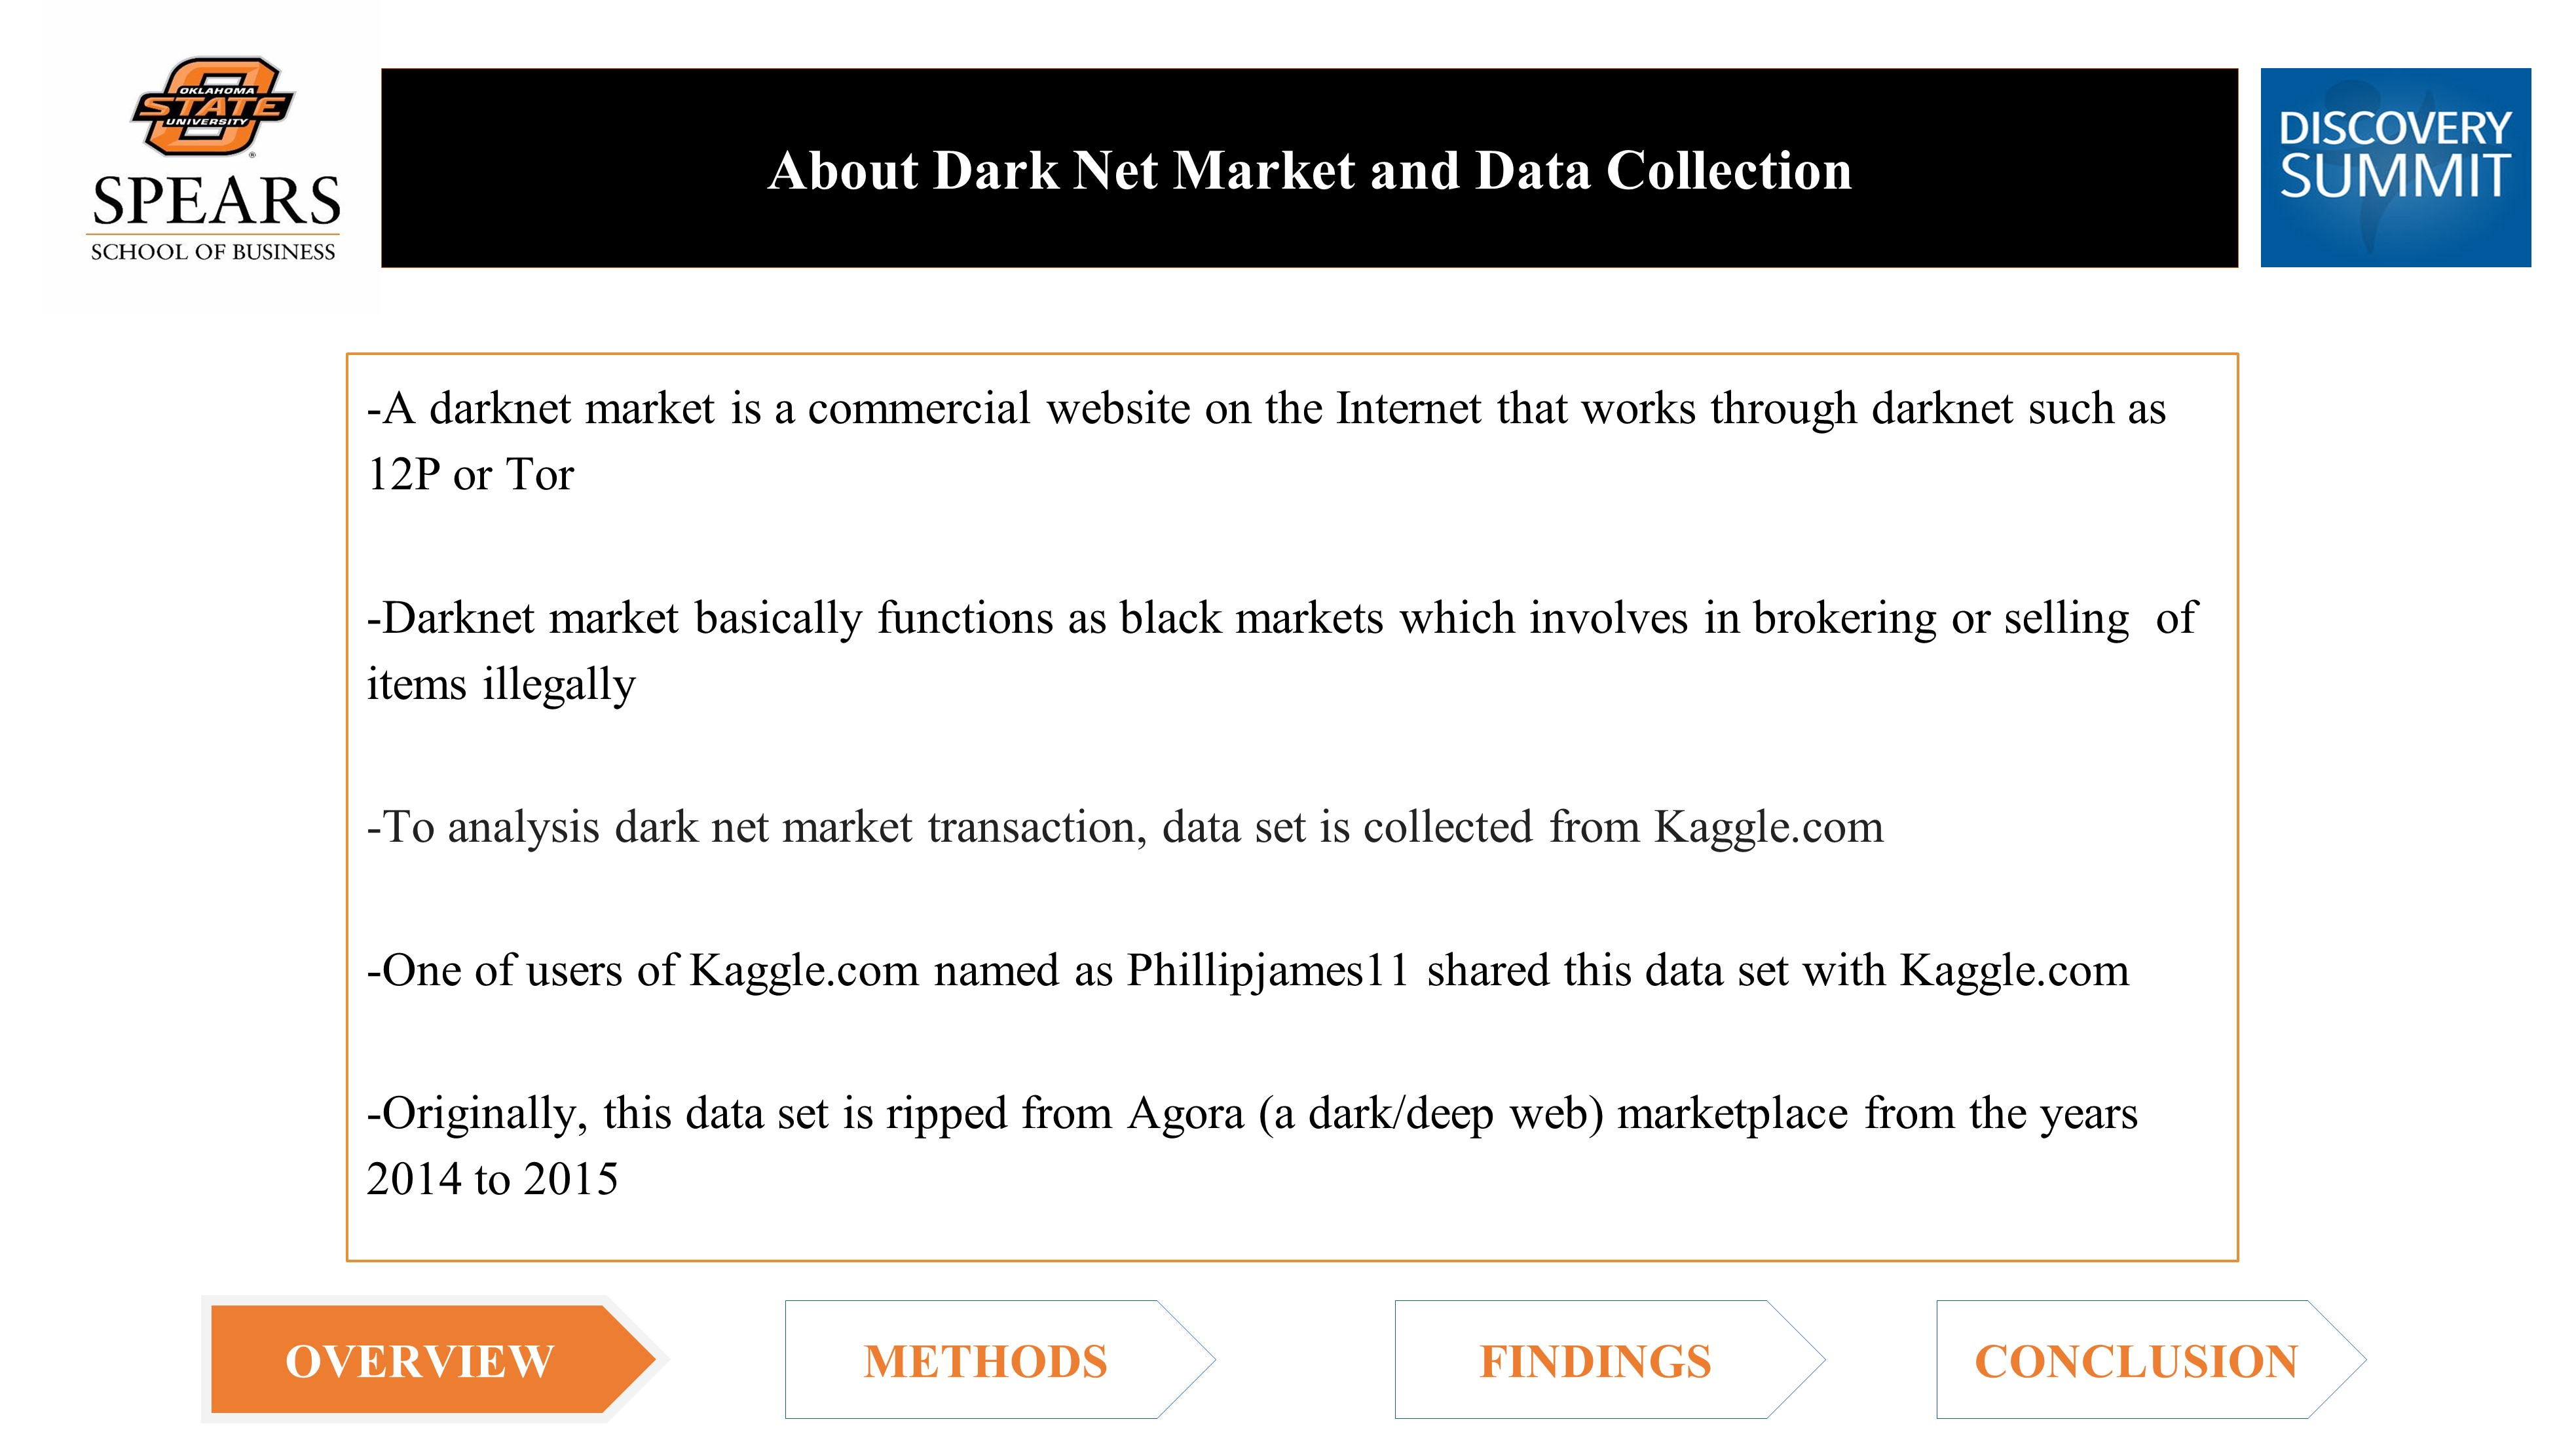 Analysis of Dark Net Market Transactions using JMP Pro 13